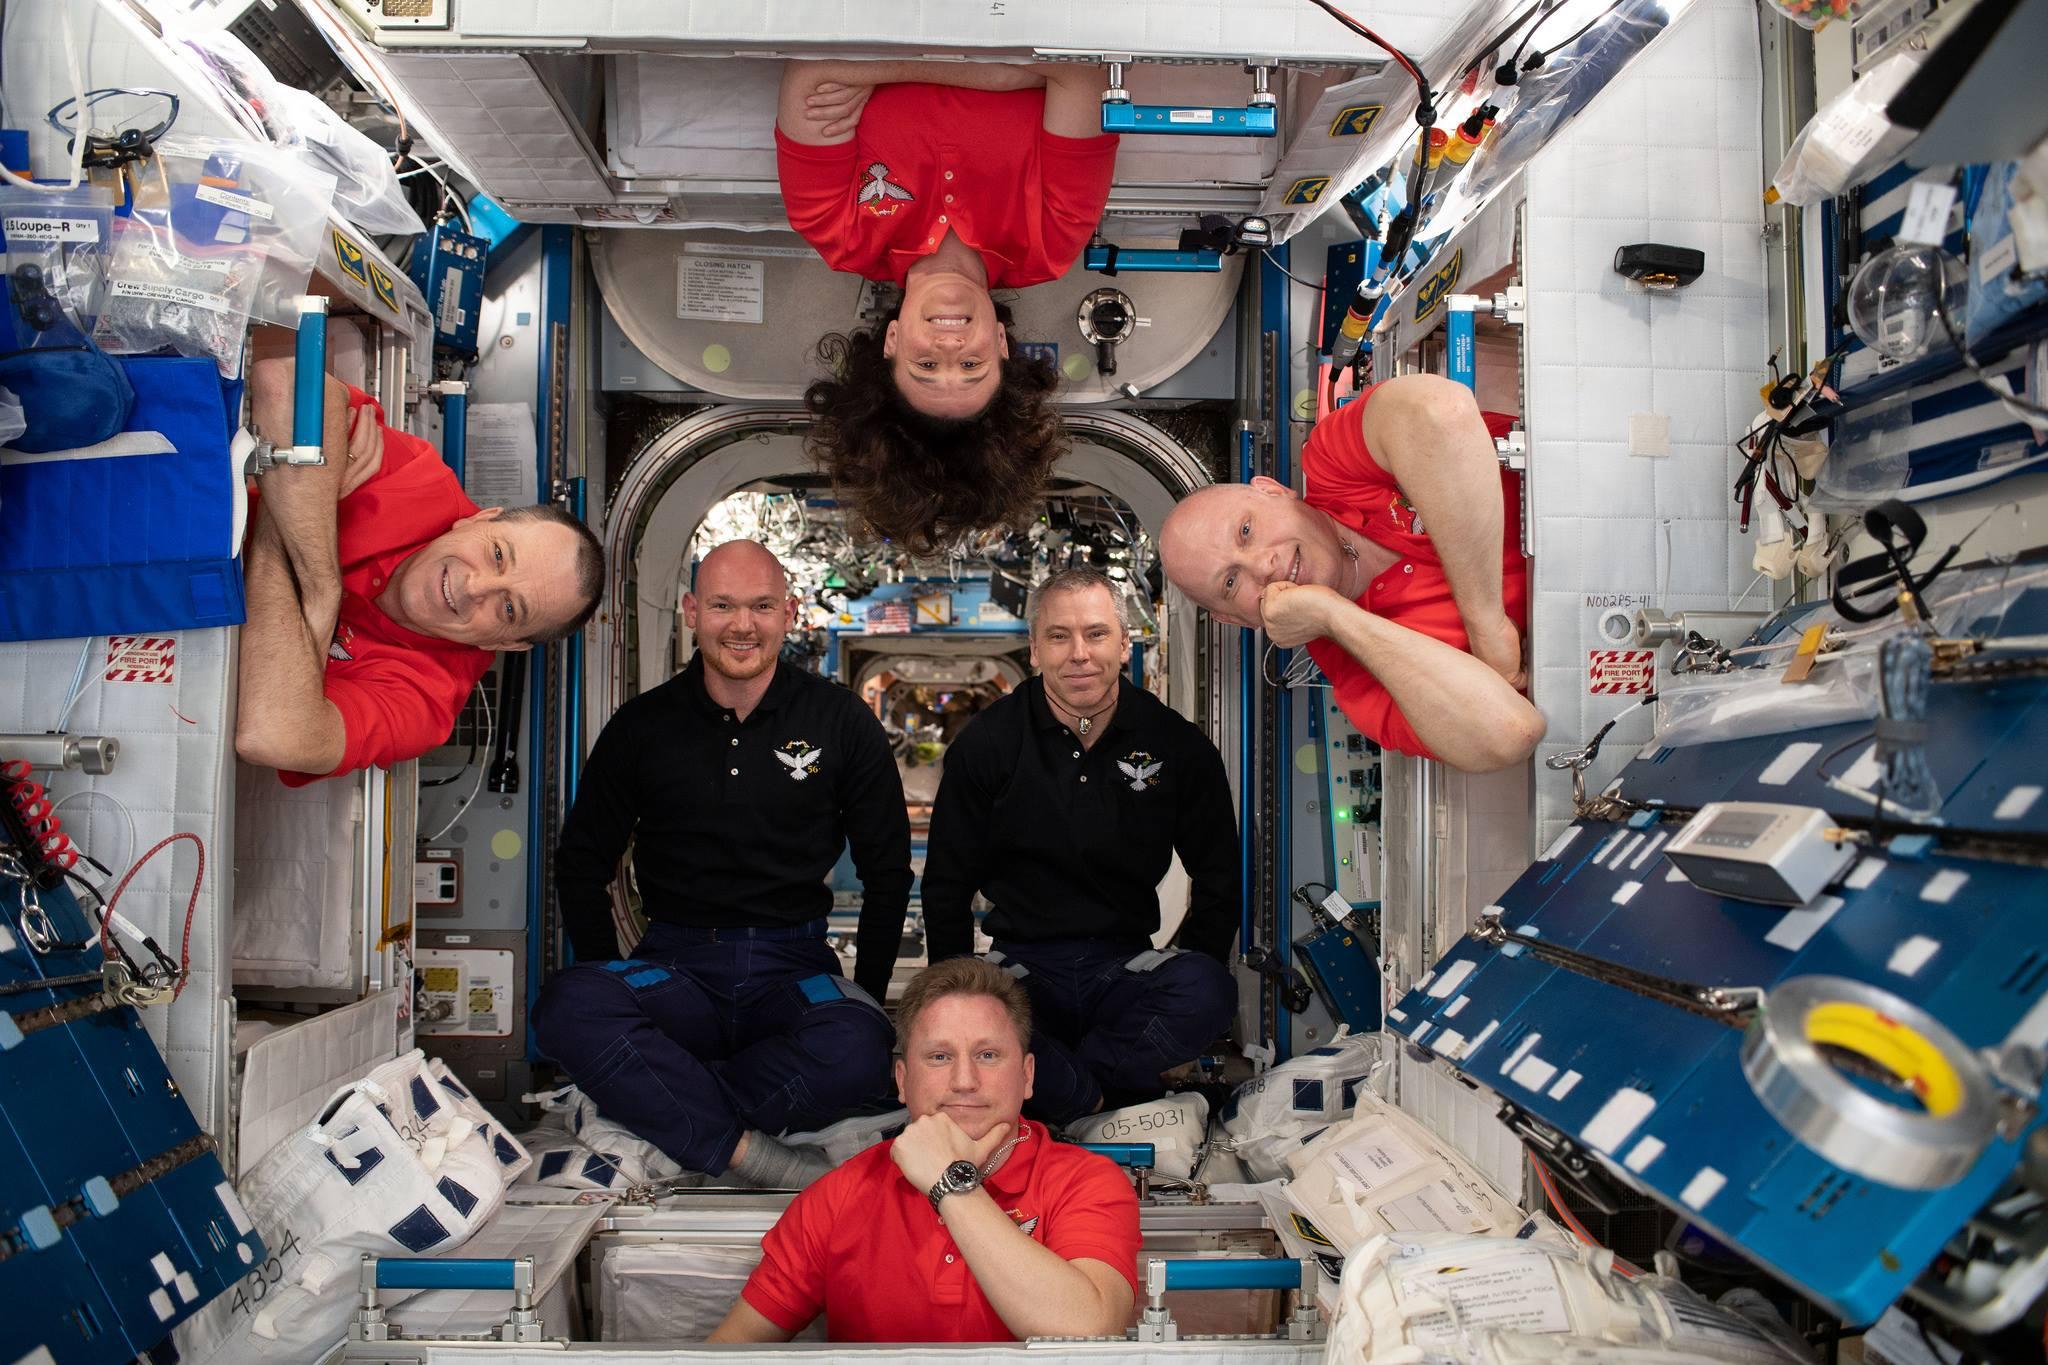 Экипаж основной экспедиции МКС-56 (Эндрю Фёйстел, Олег Артемьев, Ричард Арнольд, Сергей Прокопьев, Александер Герст, Серена Ауньон-Чэнселлор). Фото NASA